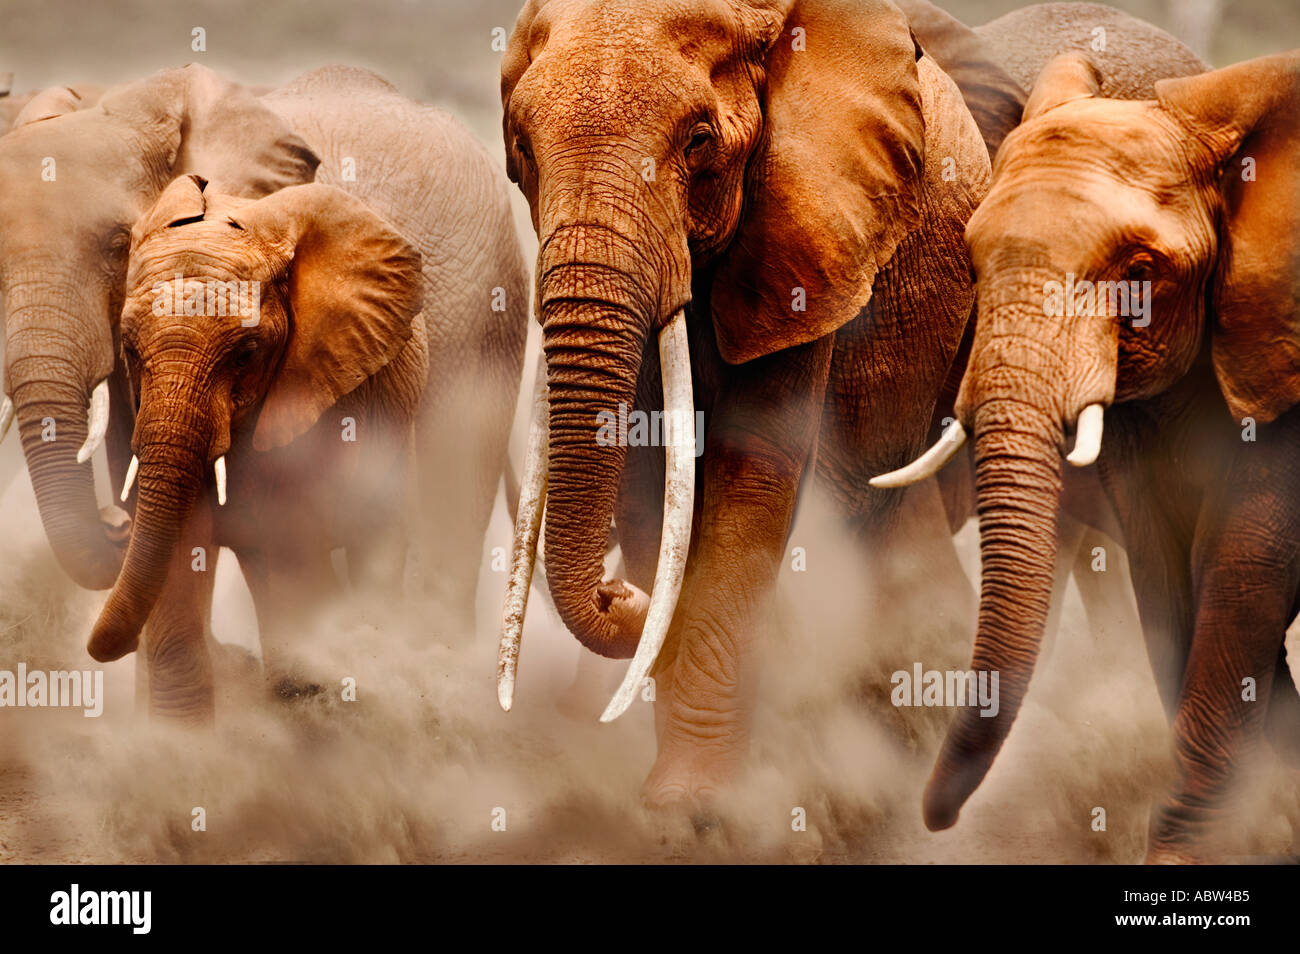 African elephant Loxodonta africana Breeding herd Amboseli National Park Kenya Dist Sub saharan Africa - Stock Image